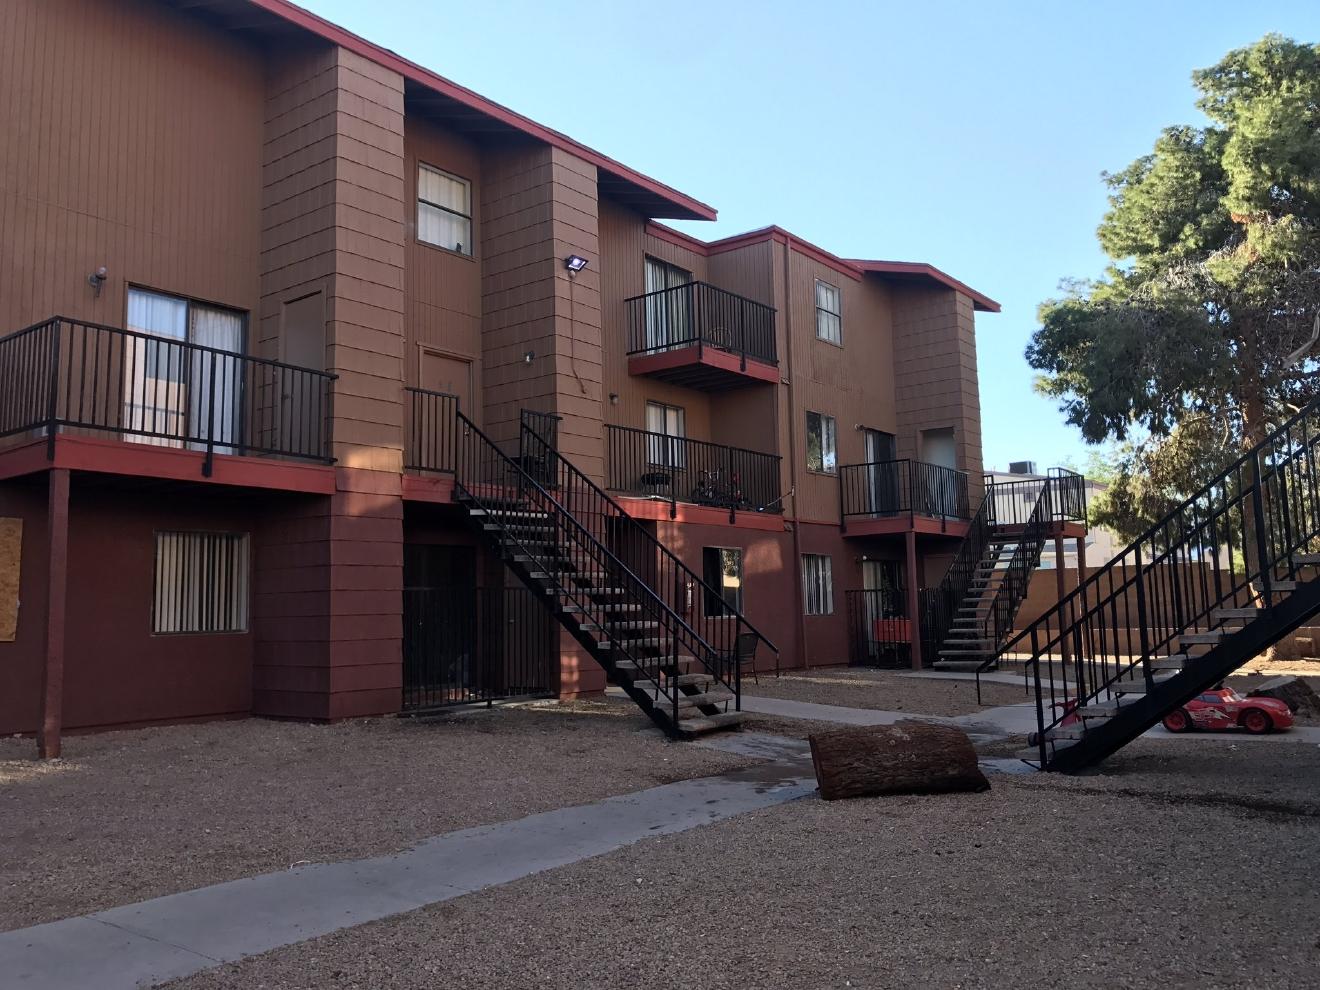 henderson rapper gunned down outside apartment party ksnv. Black Bedroom Furniture Sets. Home Design Ideas